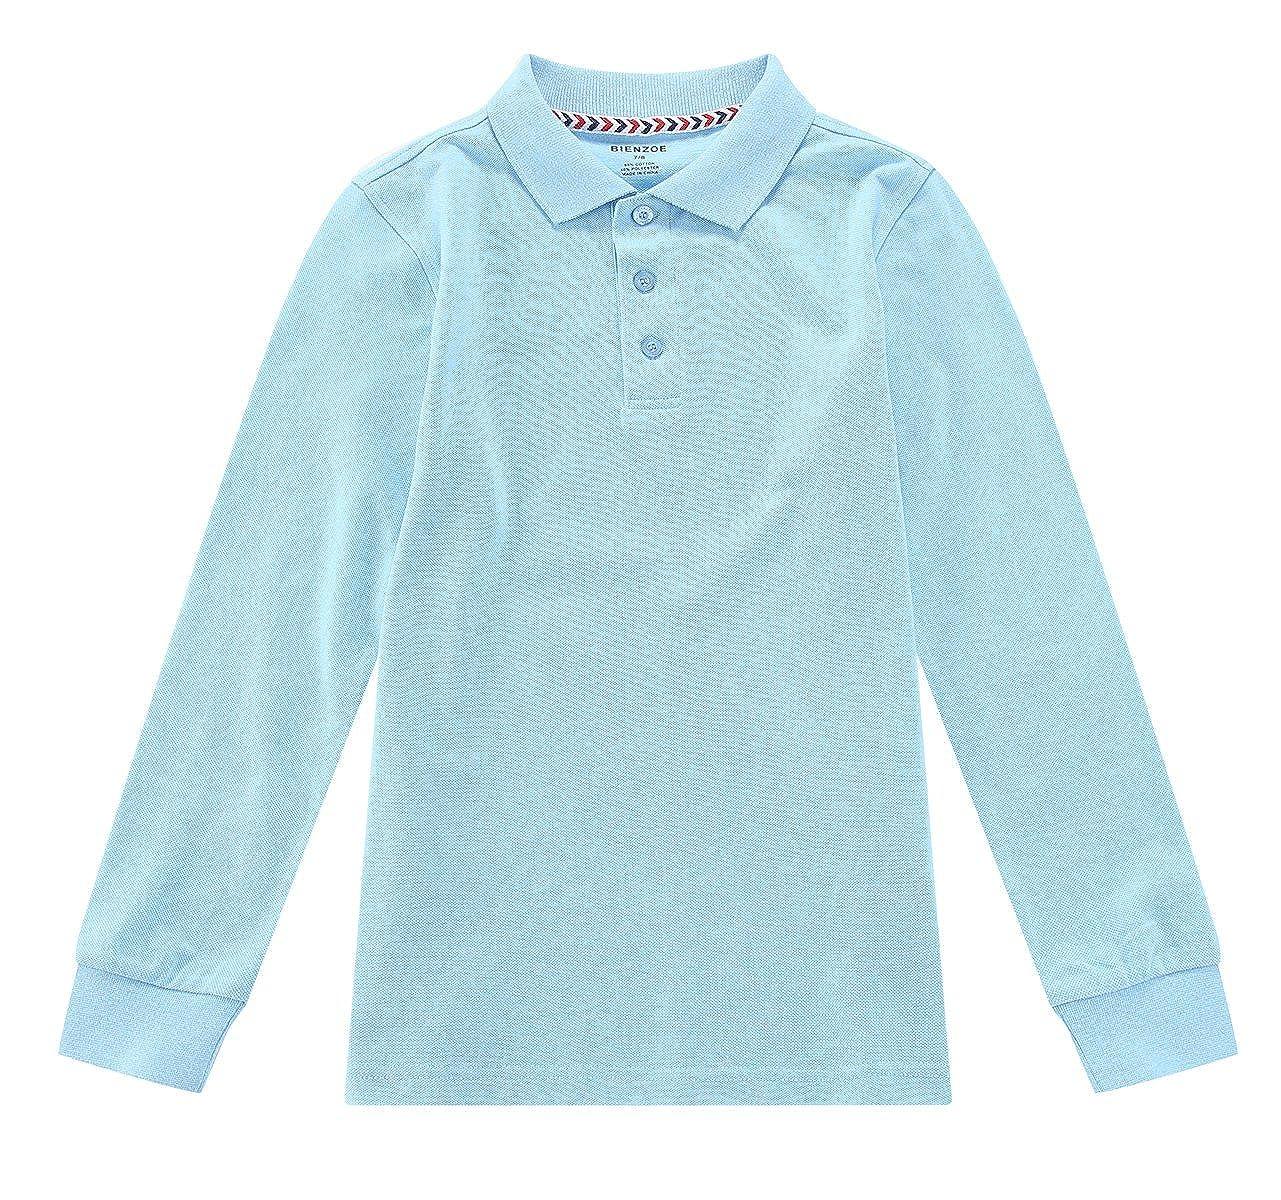 2a3f9f115 Bienzoe Boy's School Uniform Antimicrobial Breathable Quick Dry Long Sleeve  Polo: Amazon.co.uk: Clothing